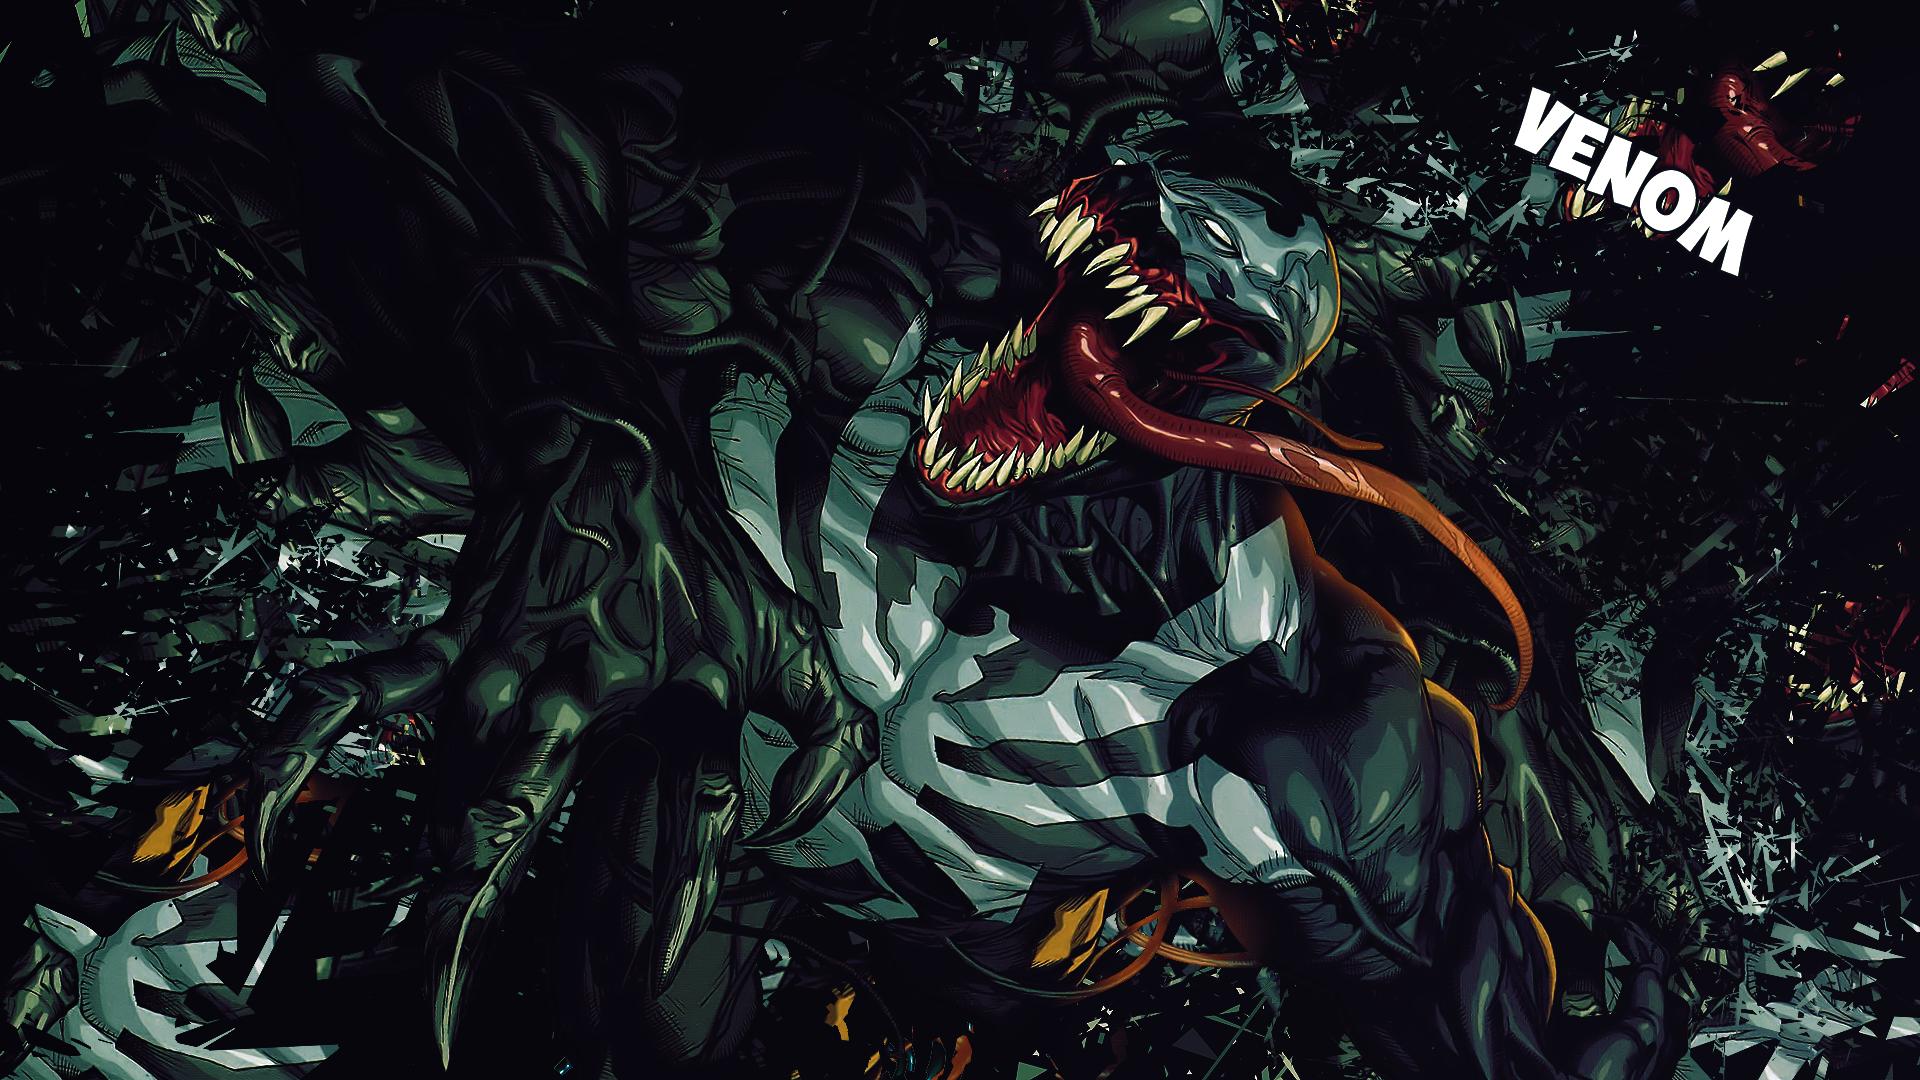 Letest Top10 Hate Love Wallpaper In Hd Or Widescreen: Wallpaper Comic Venom